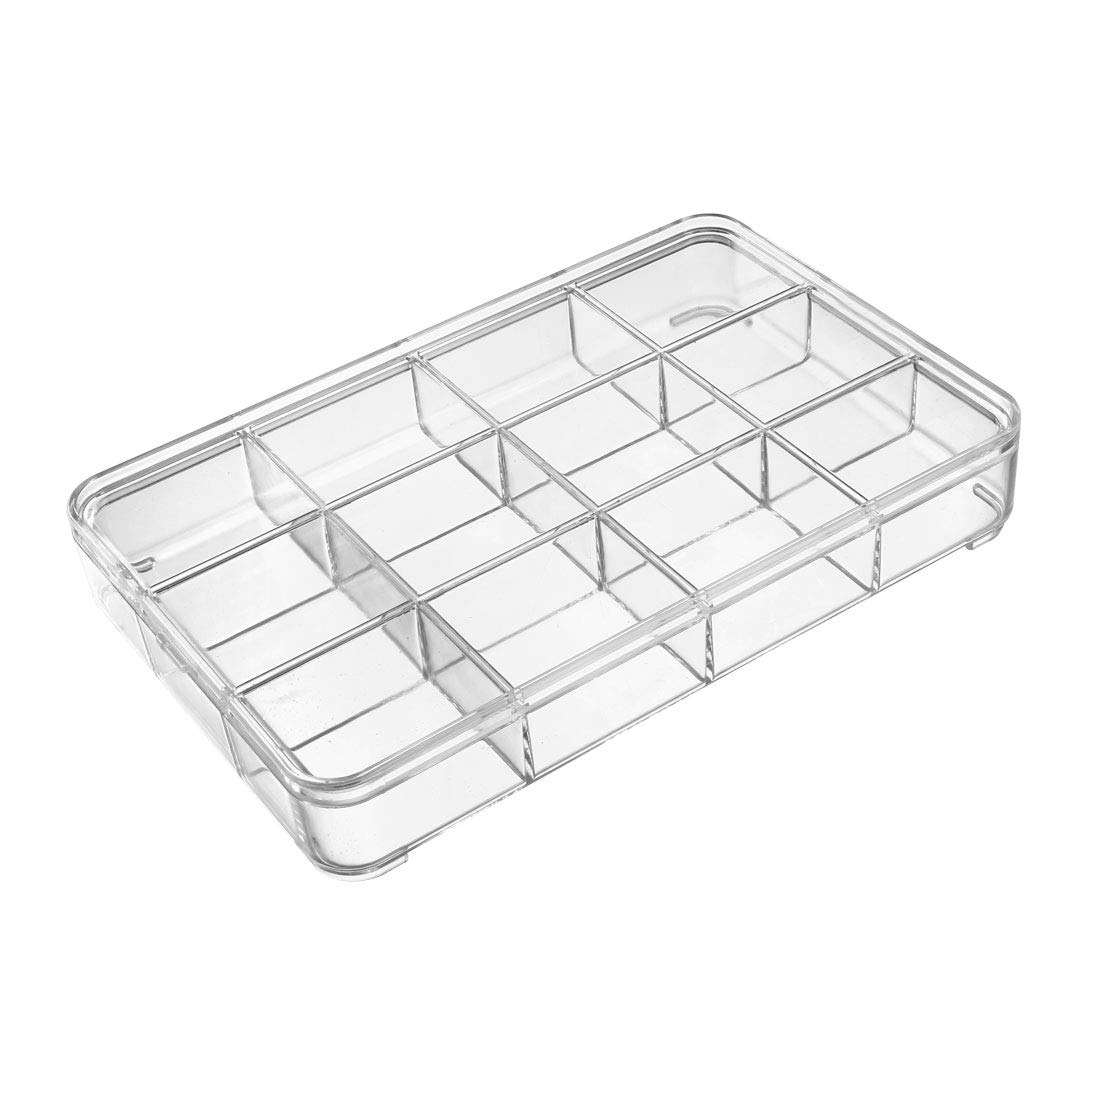 18 Inches x 72 ... Silver Diamond Plate Resilia Premium Tool Box Drawer Liner